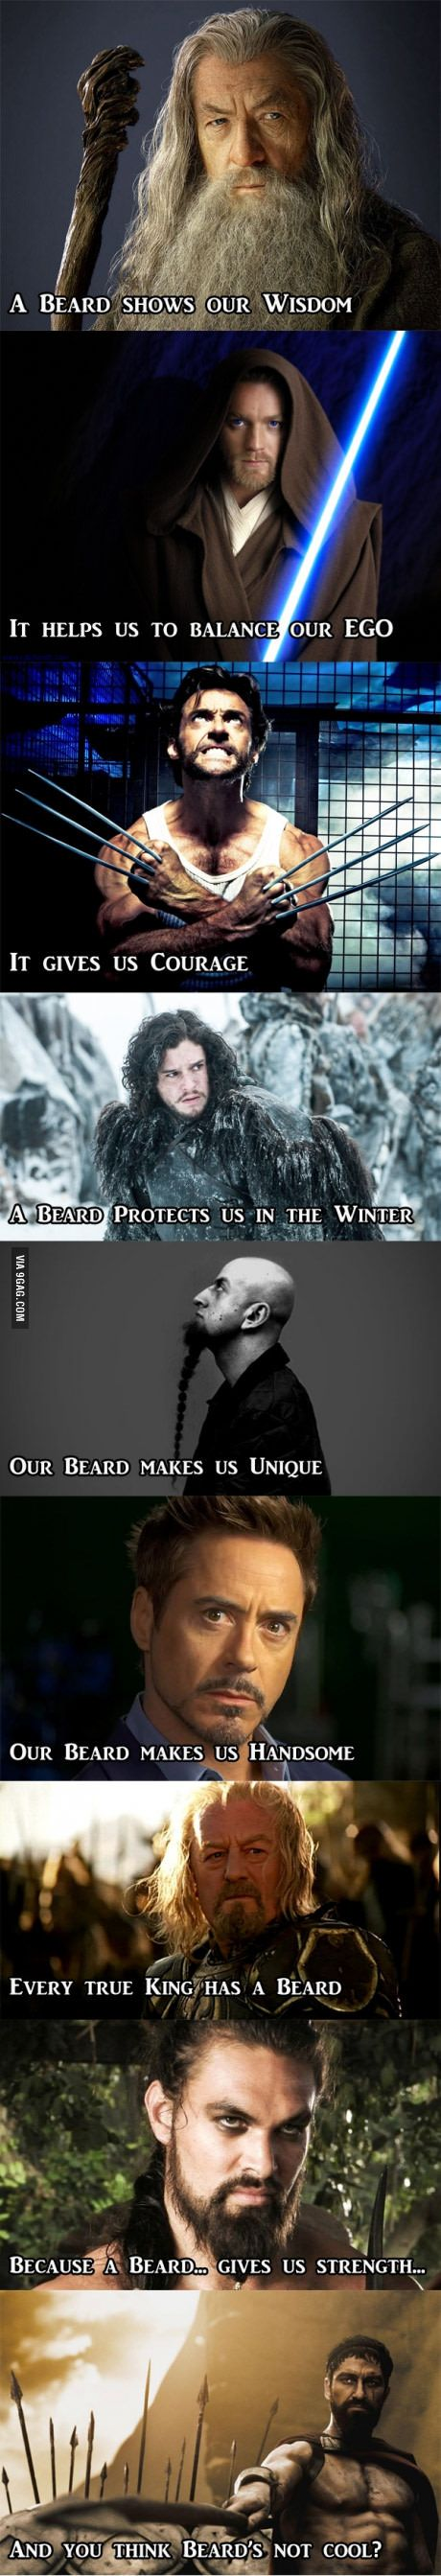 9 Reasons Beard Is Cool